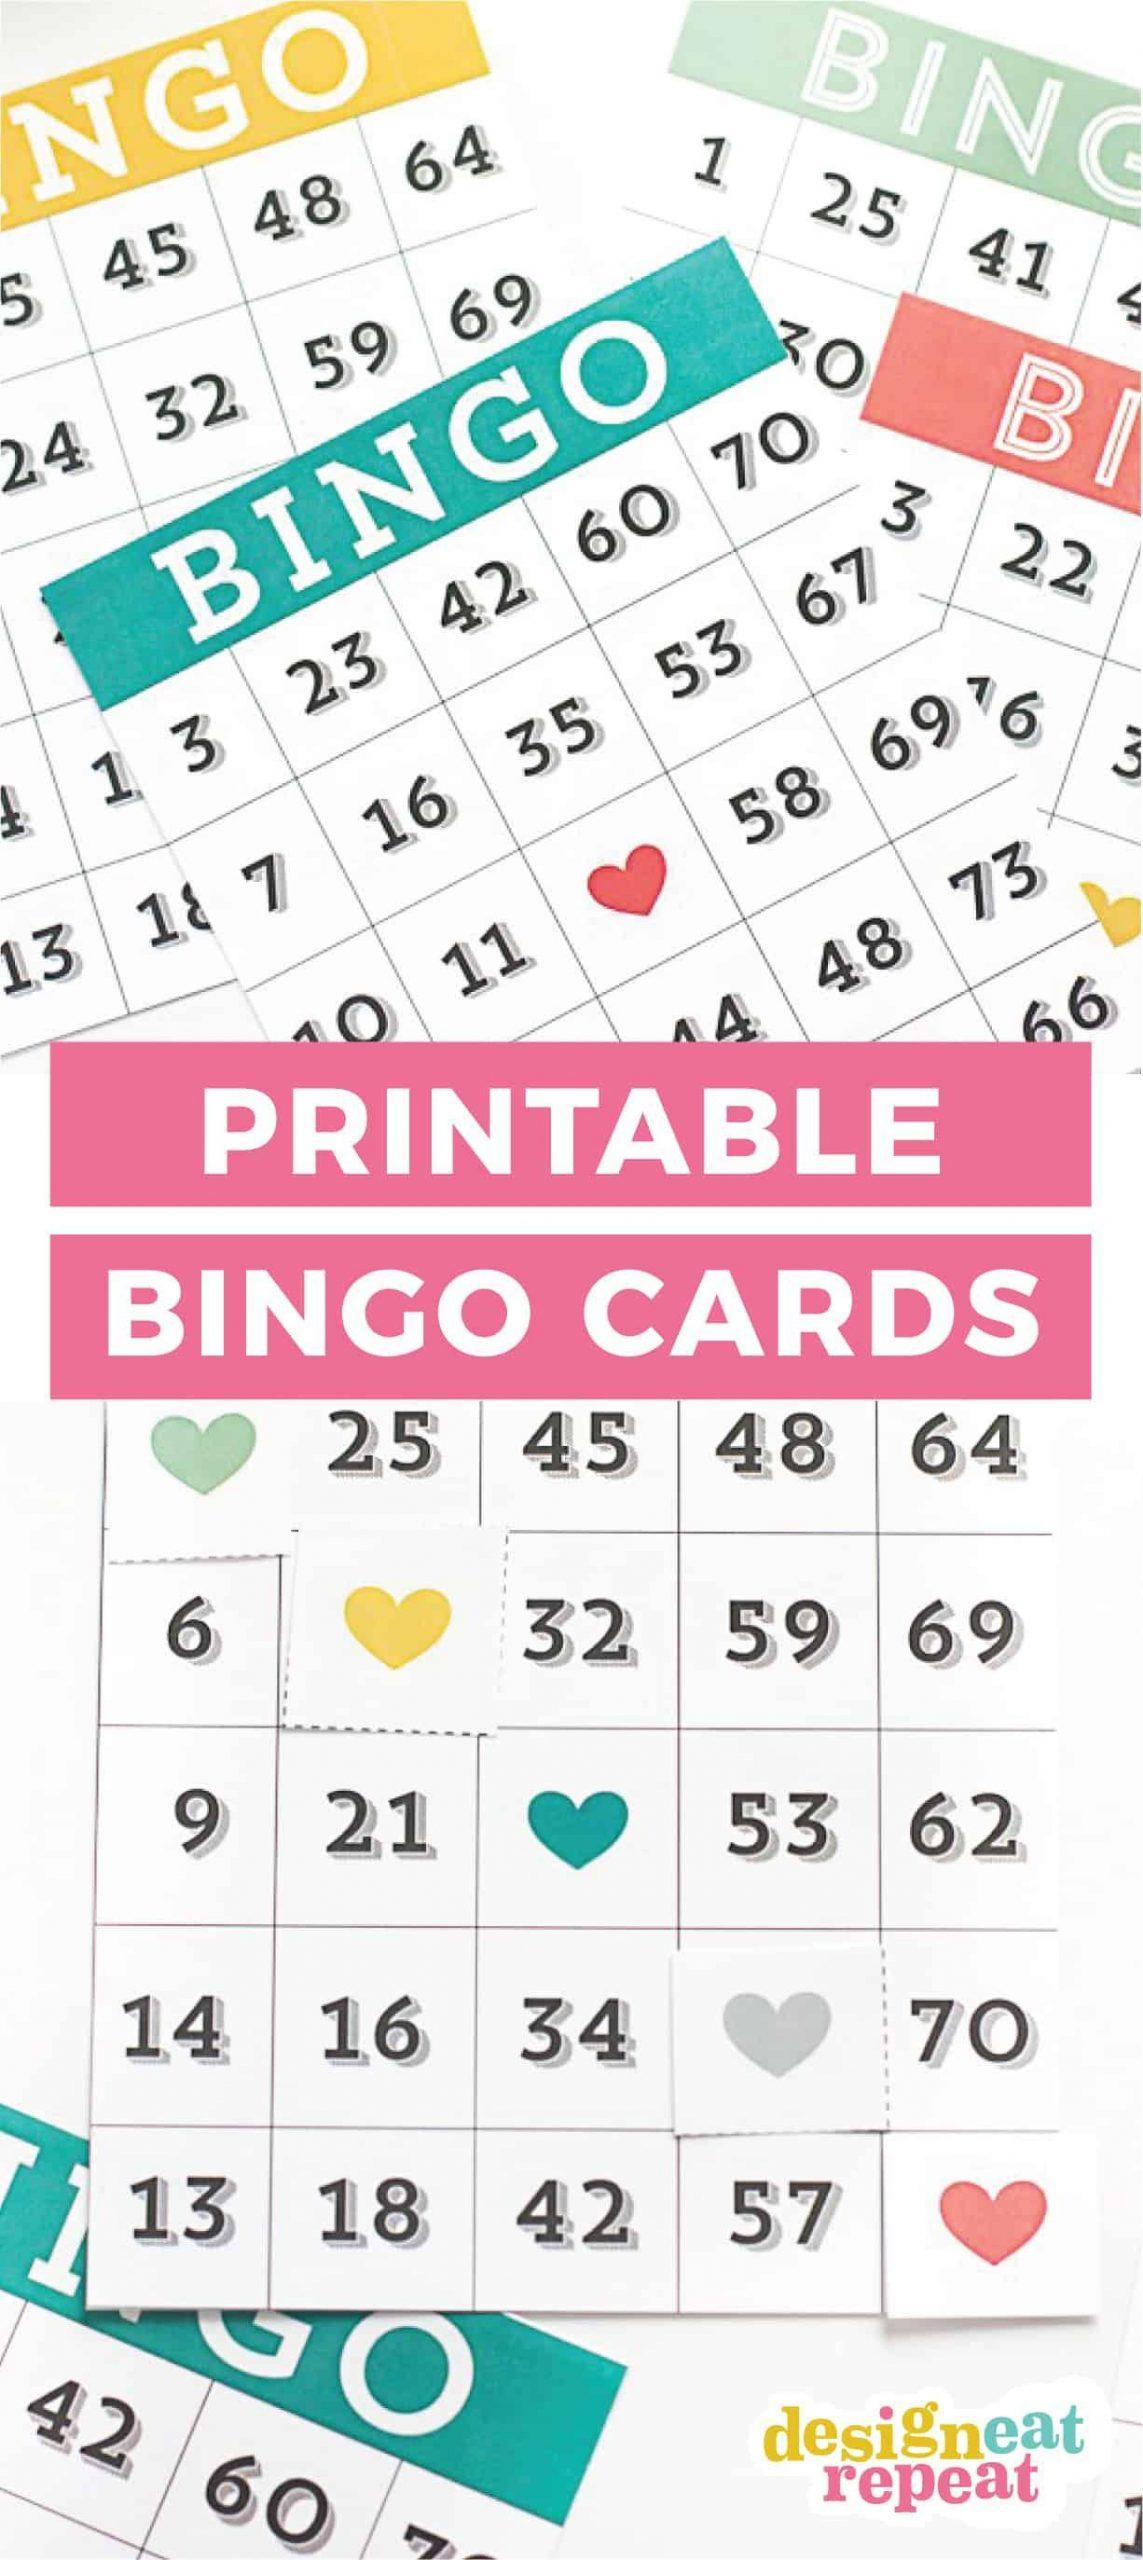 Printable Bingo Cards - Game Night Idea! | Bingo Cards